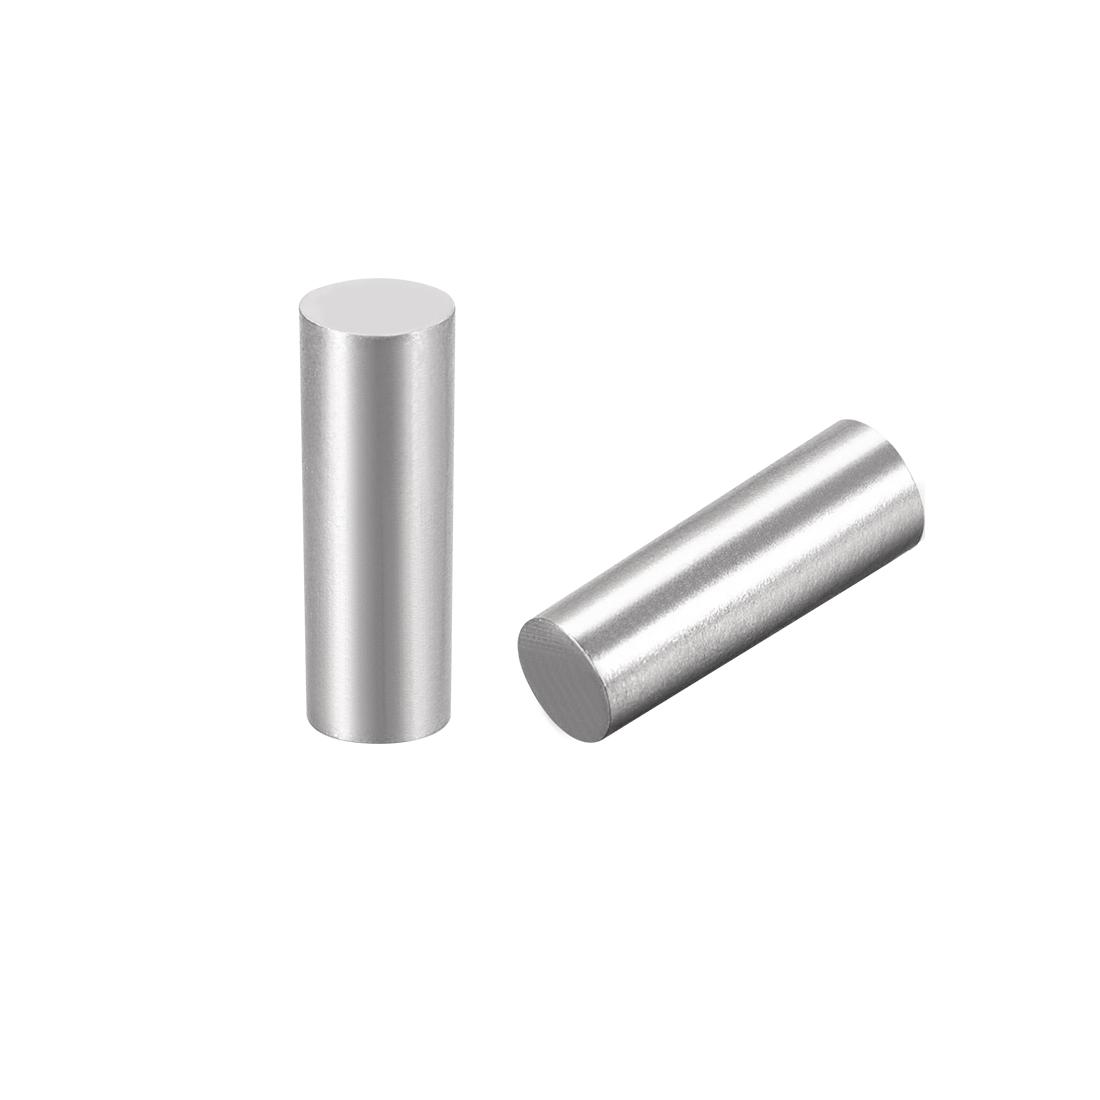 2Pcs 4mm x 10mm 1:50 Taper Pin 304 Stainless Steel Shelf Support Pin Fasten